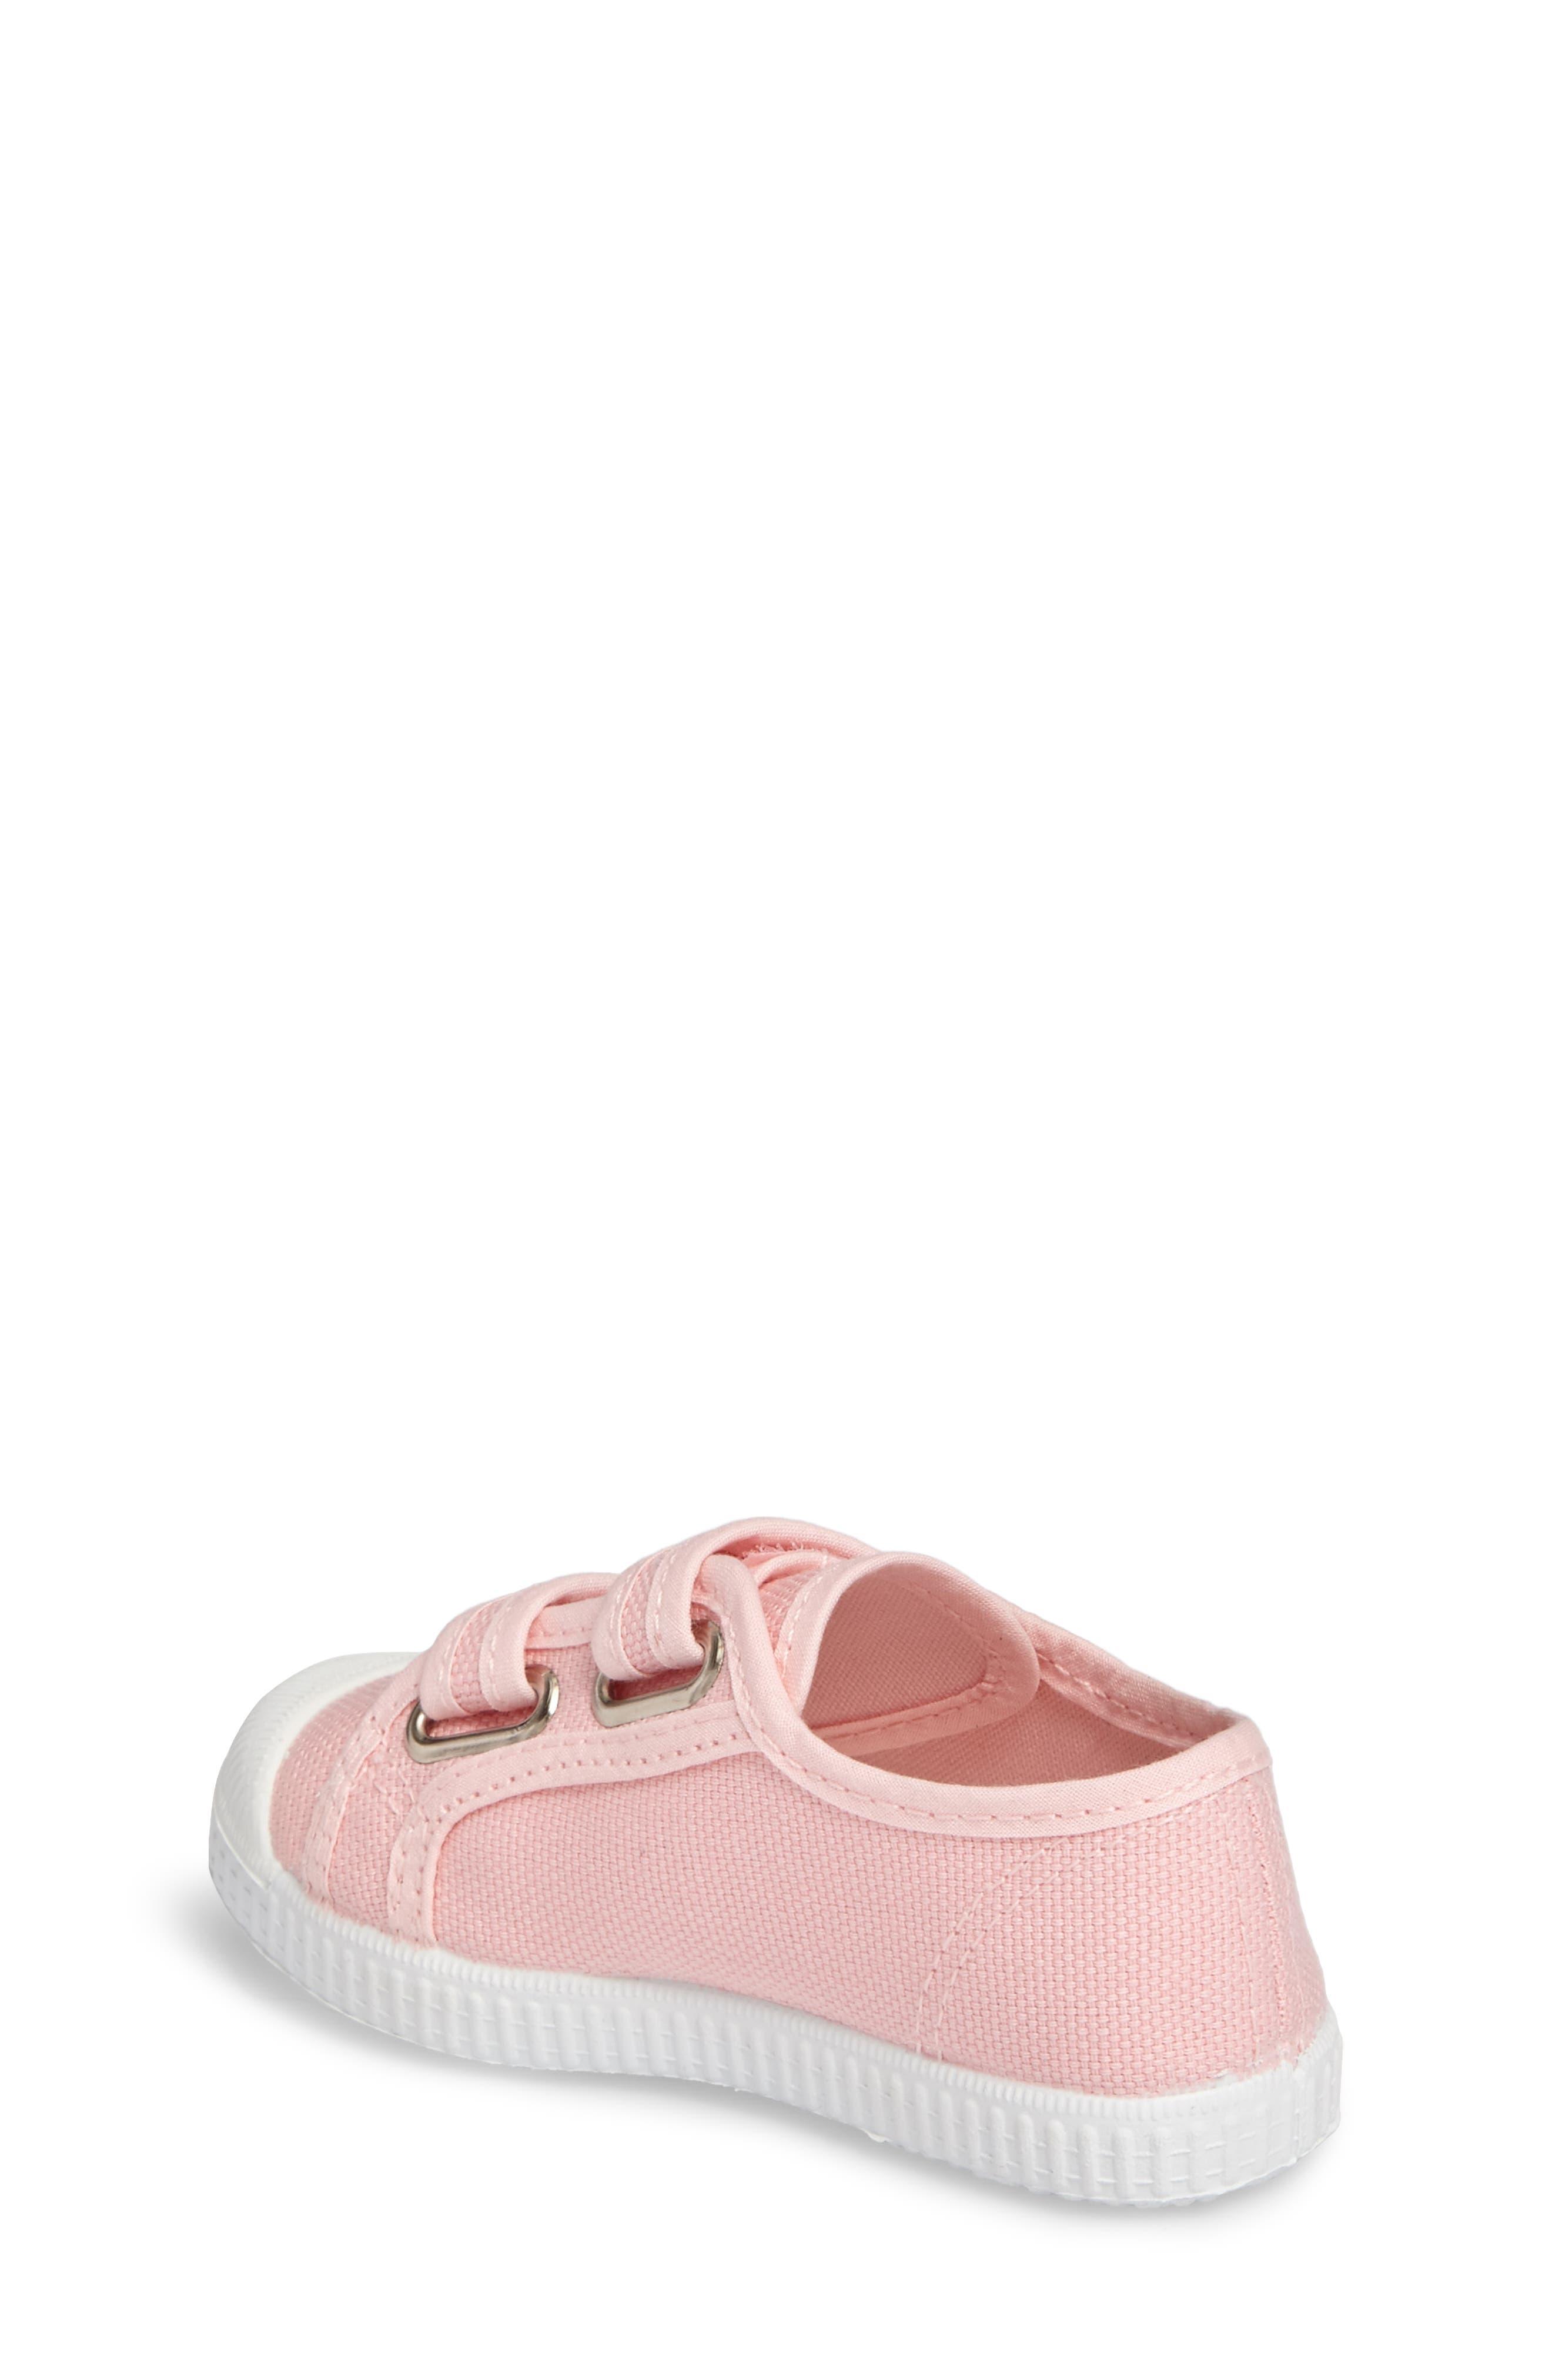 Alternate Image 2  - Cienta Canvas Sneaker (Walker & Toddler)